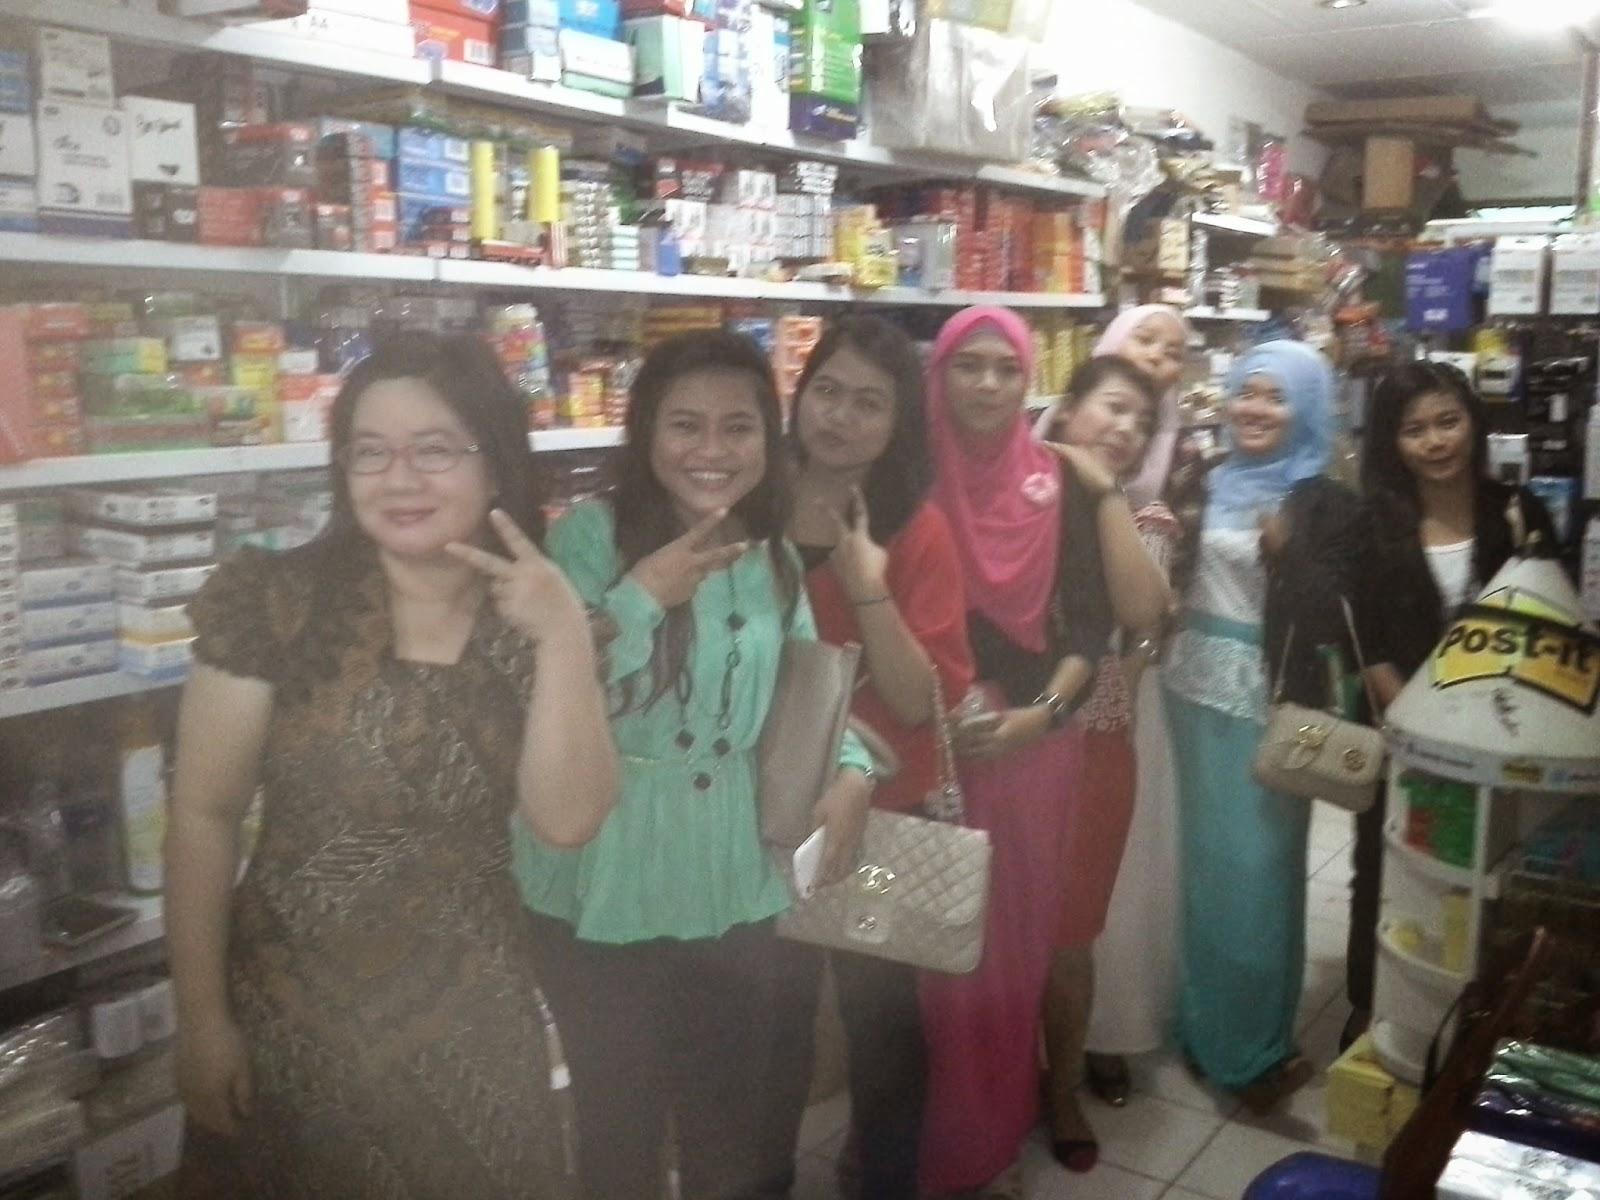 Toko ATK Harga Grosir melayani dengan Ramah dan Bersahabat di Bina Mandiri Stationery - toko alat tulis kantor